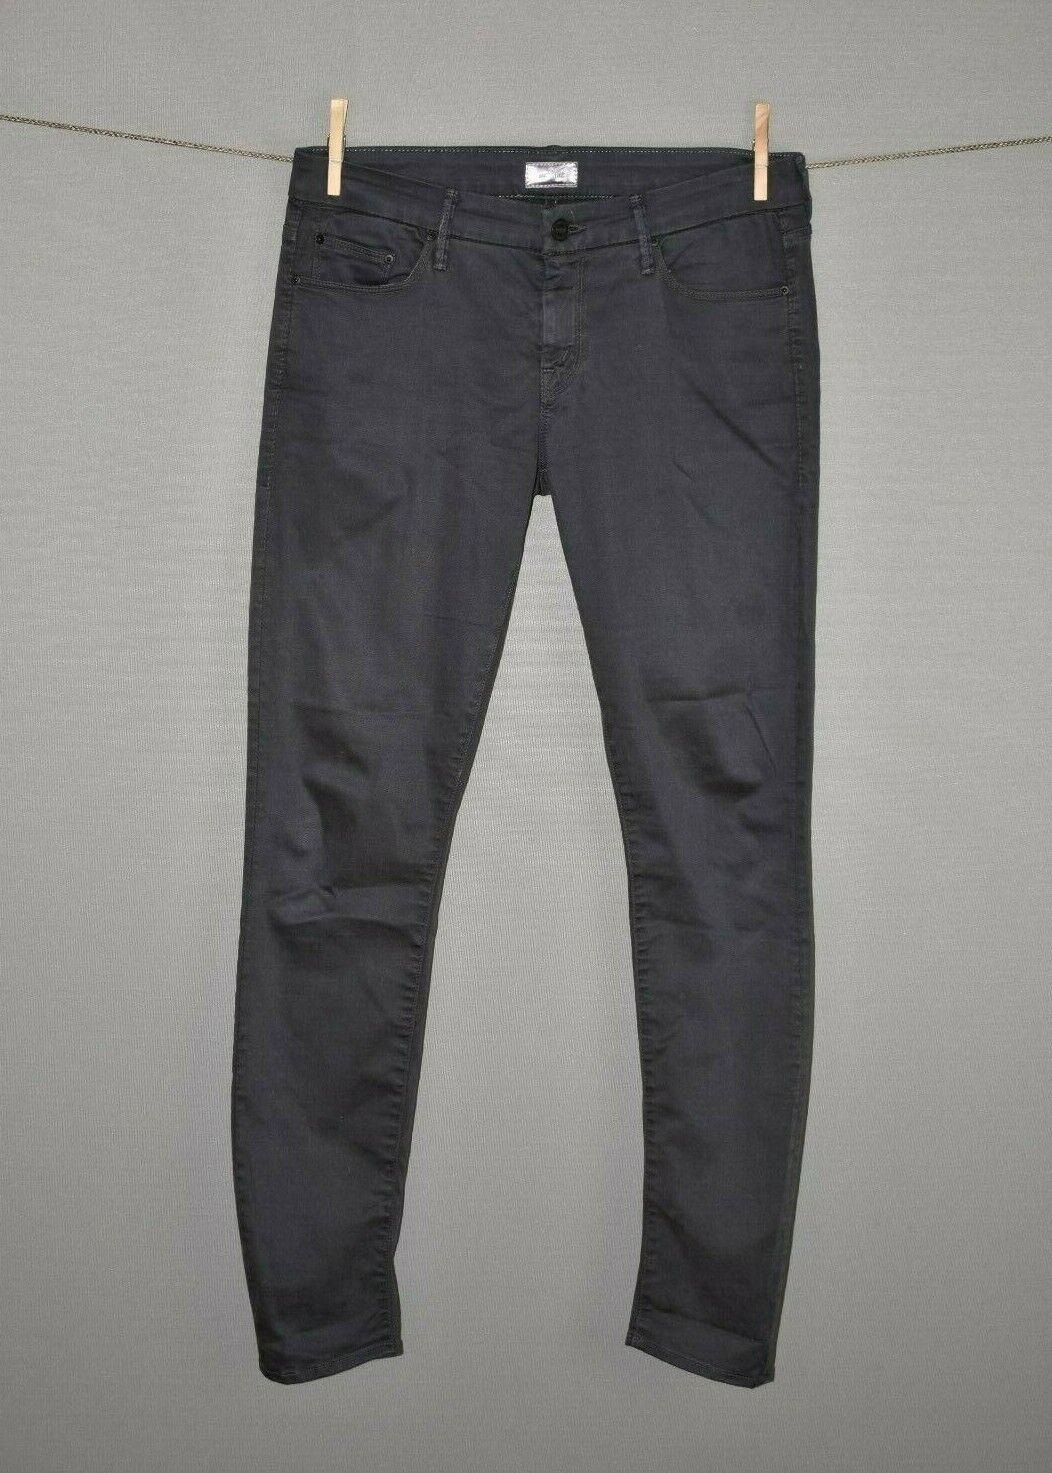 MOTHER JEANS  The Looker Skinny Jean in Slate Size 29